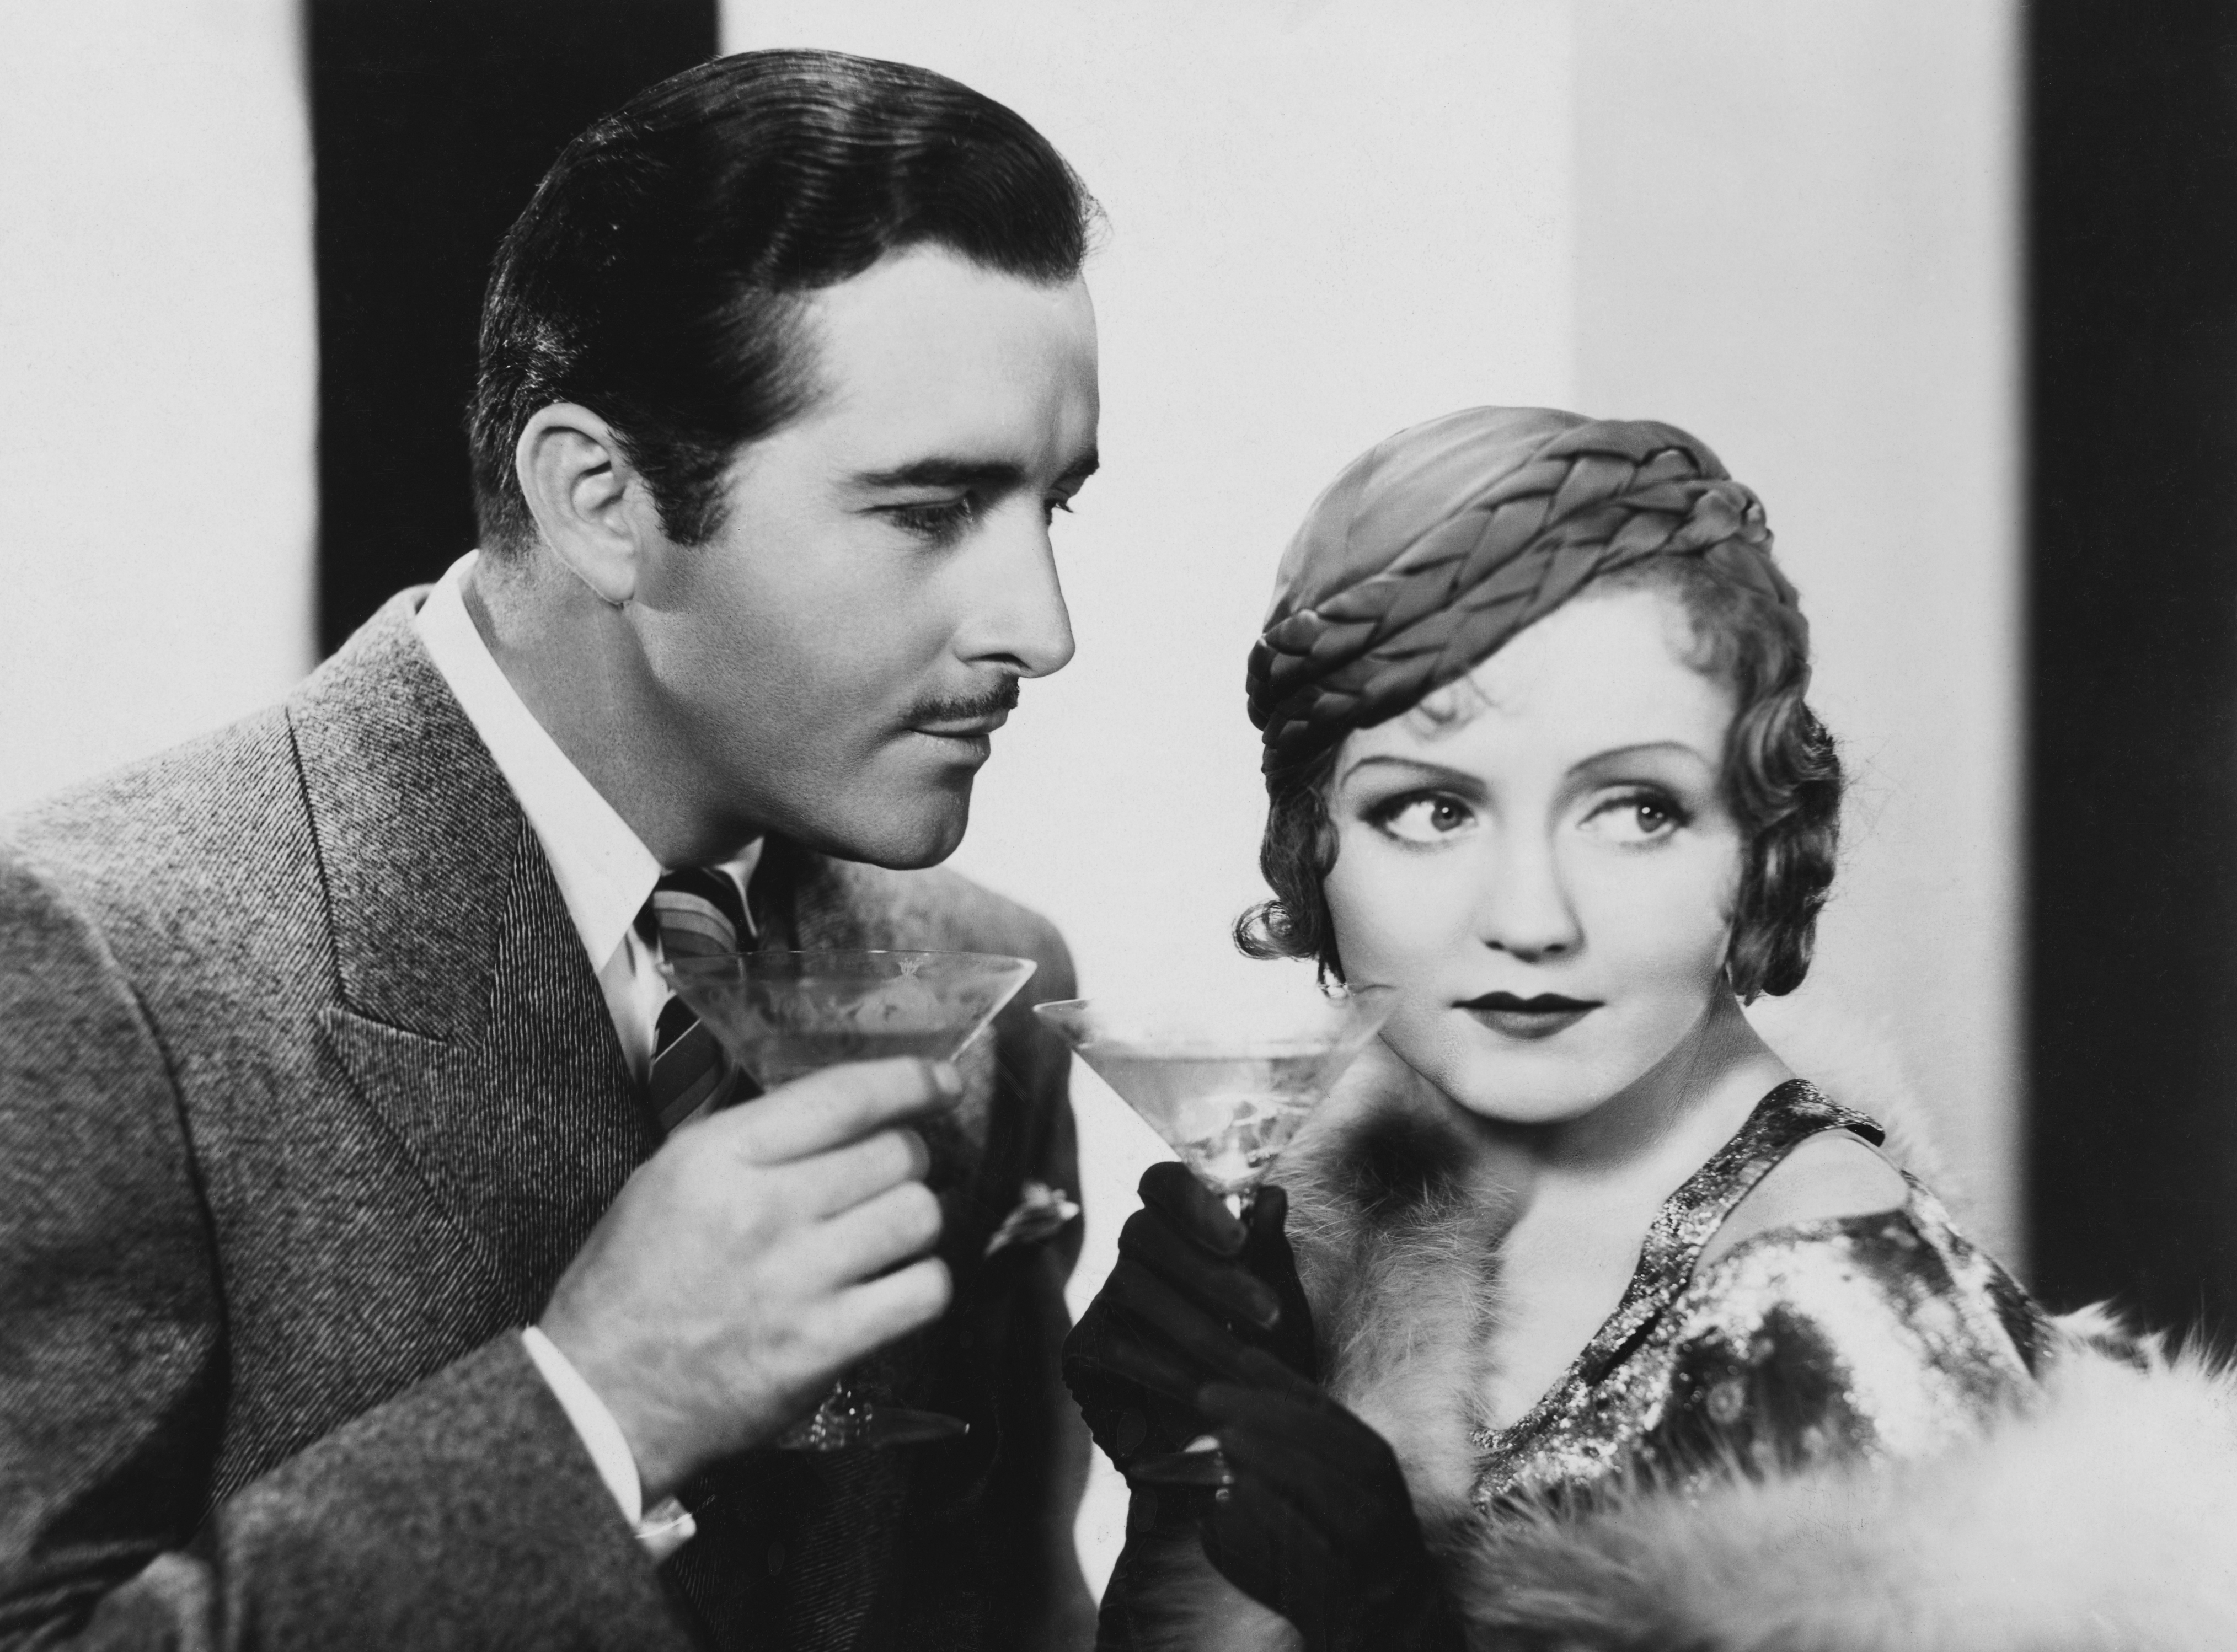 John Boles as Paul Vanderkill and Nancy Carroll as Madeleine McGonegal in Child of Manhattan (1933).